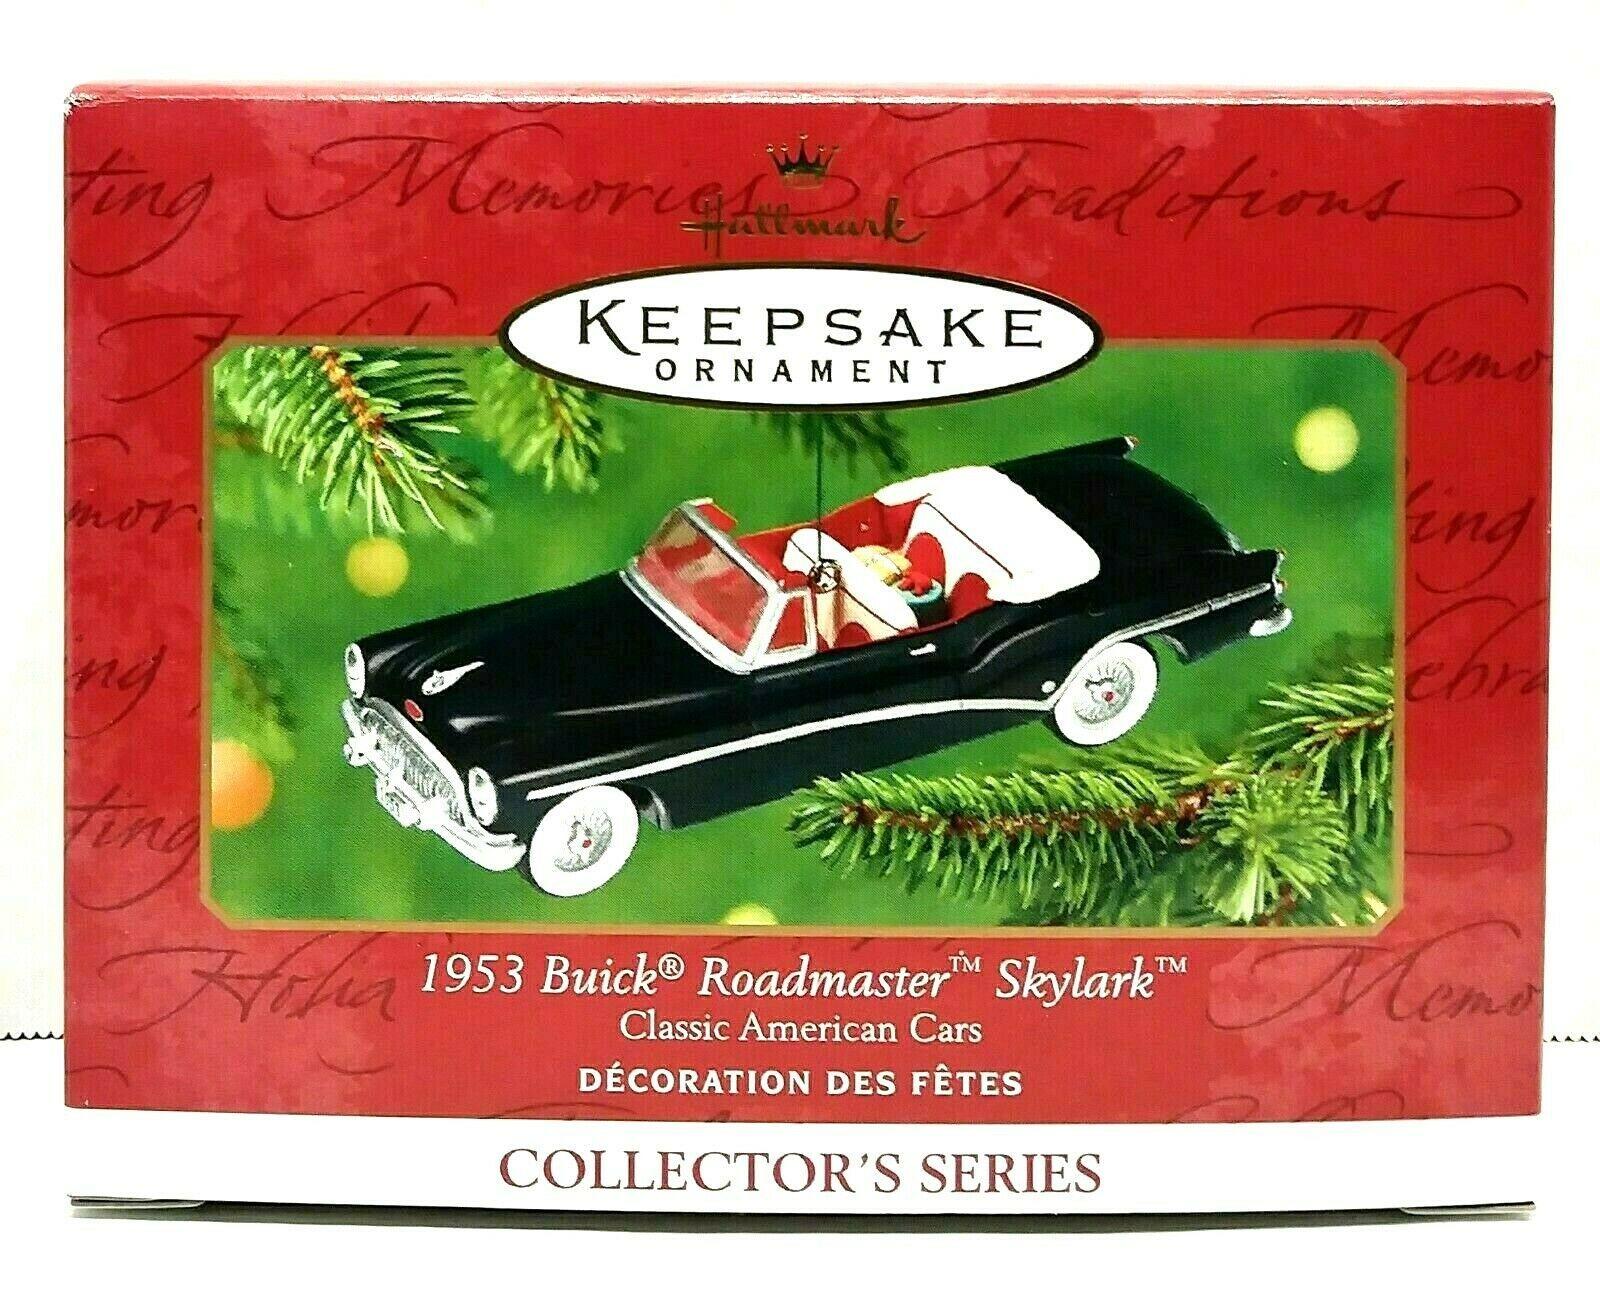 2001 Hallmark Keepsake 1953 Buick Roadmaster Skylark Ornament QX6872 - $15.00